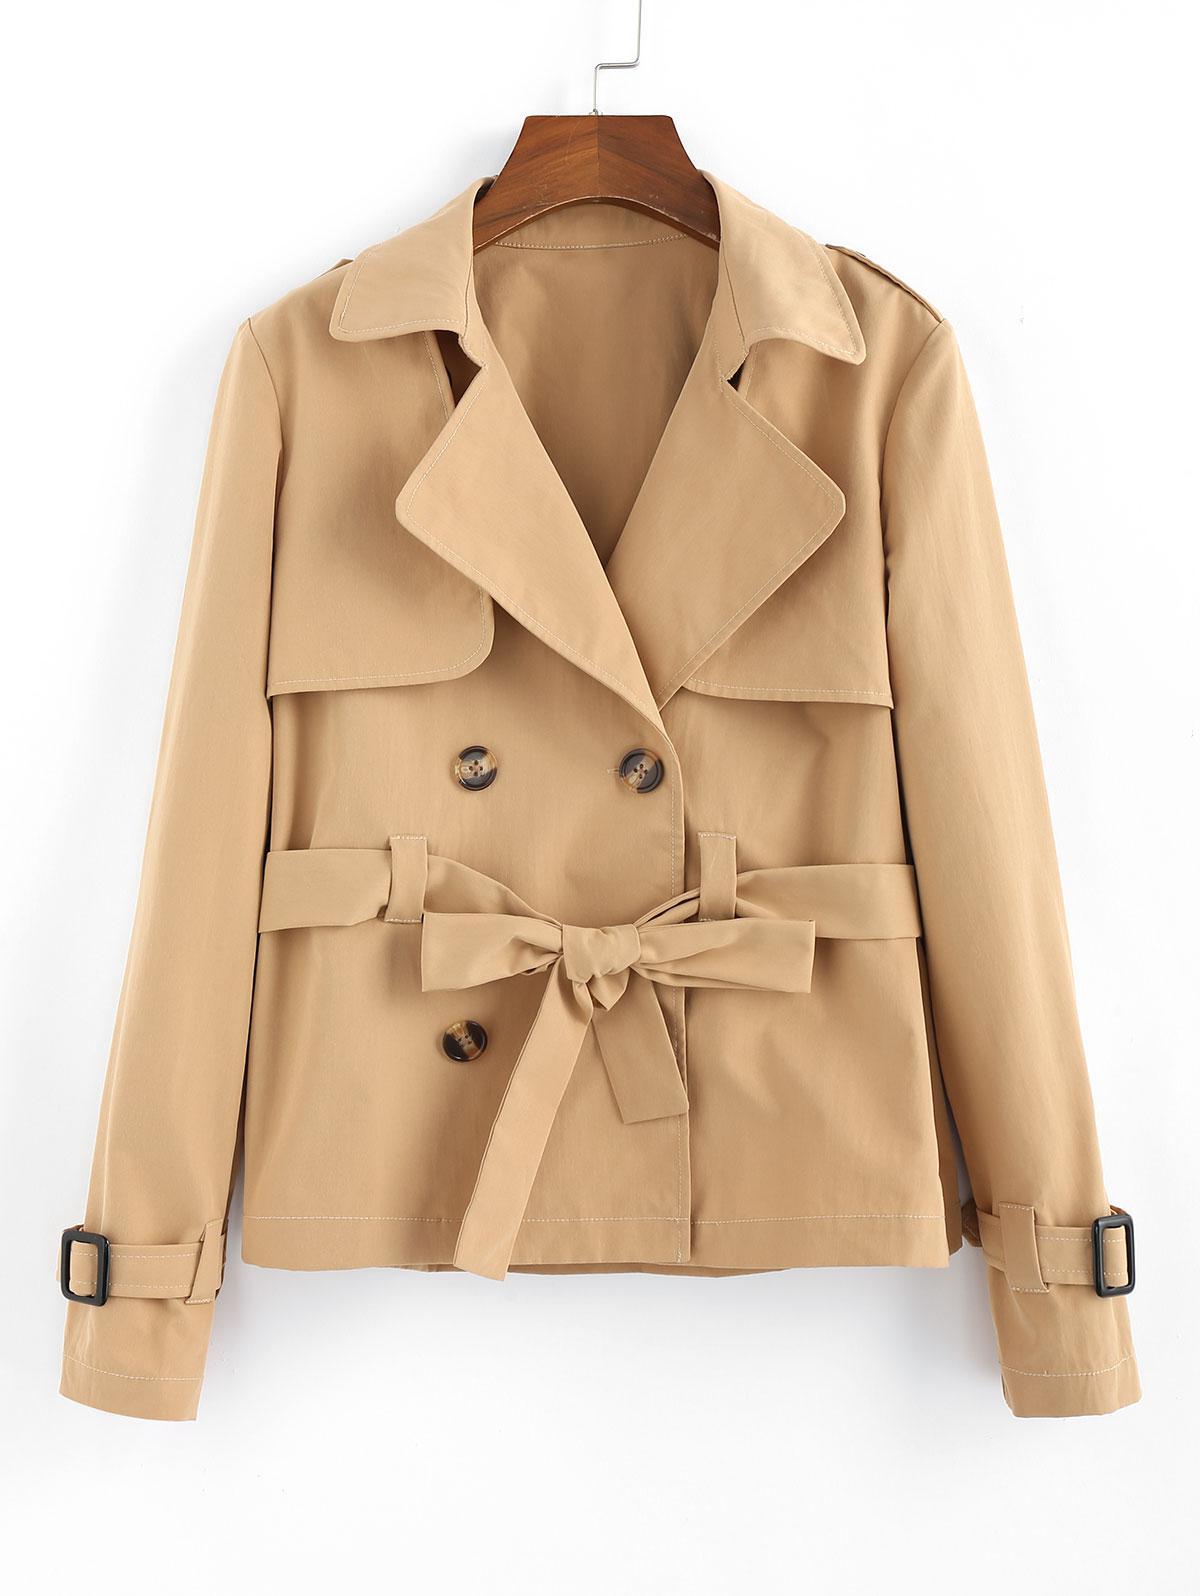 ZAFUL Double Breasted Belted Overlap Jacket